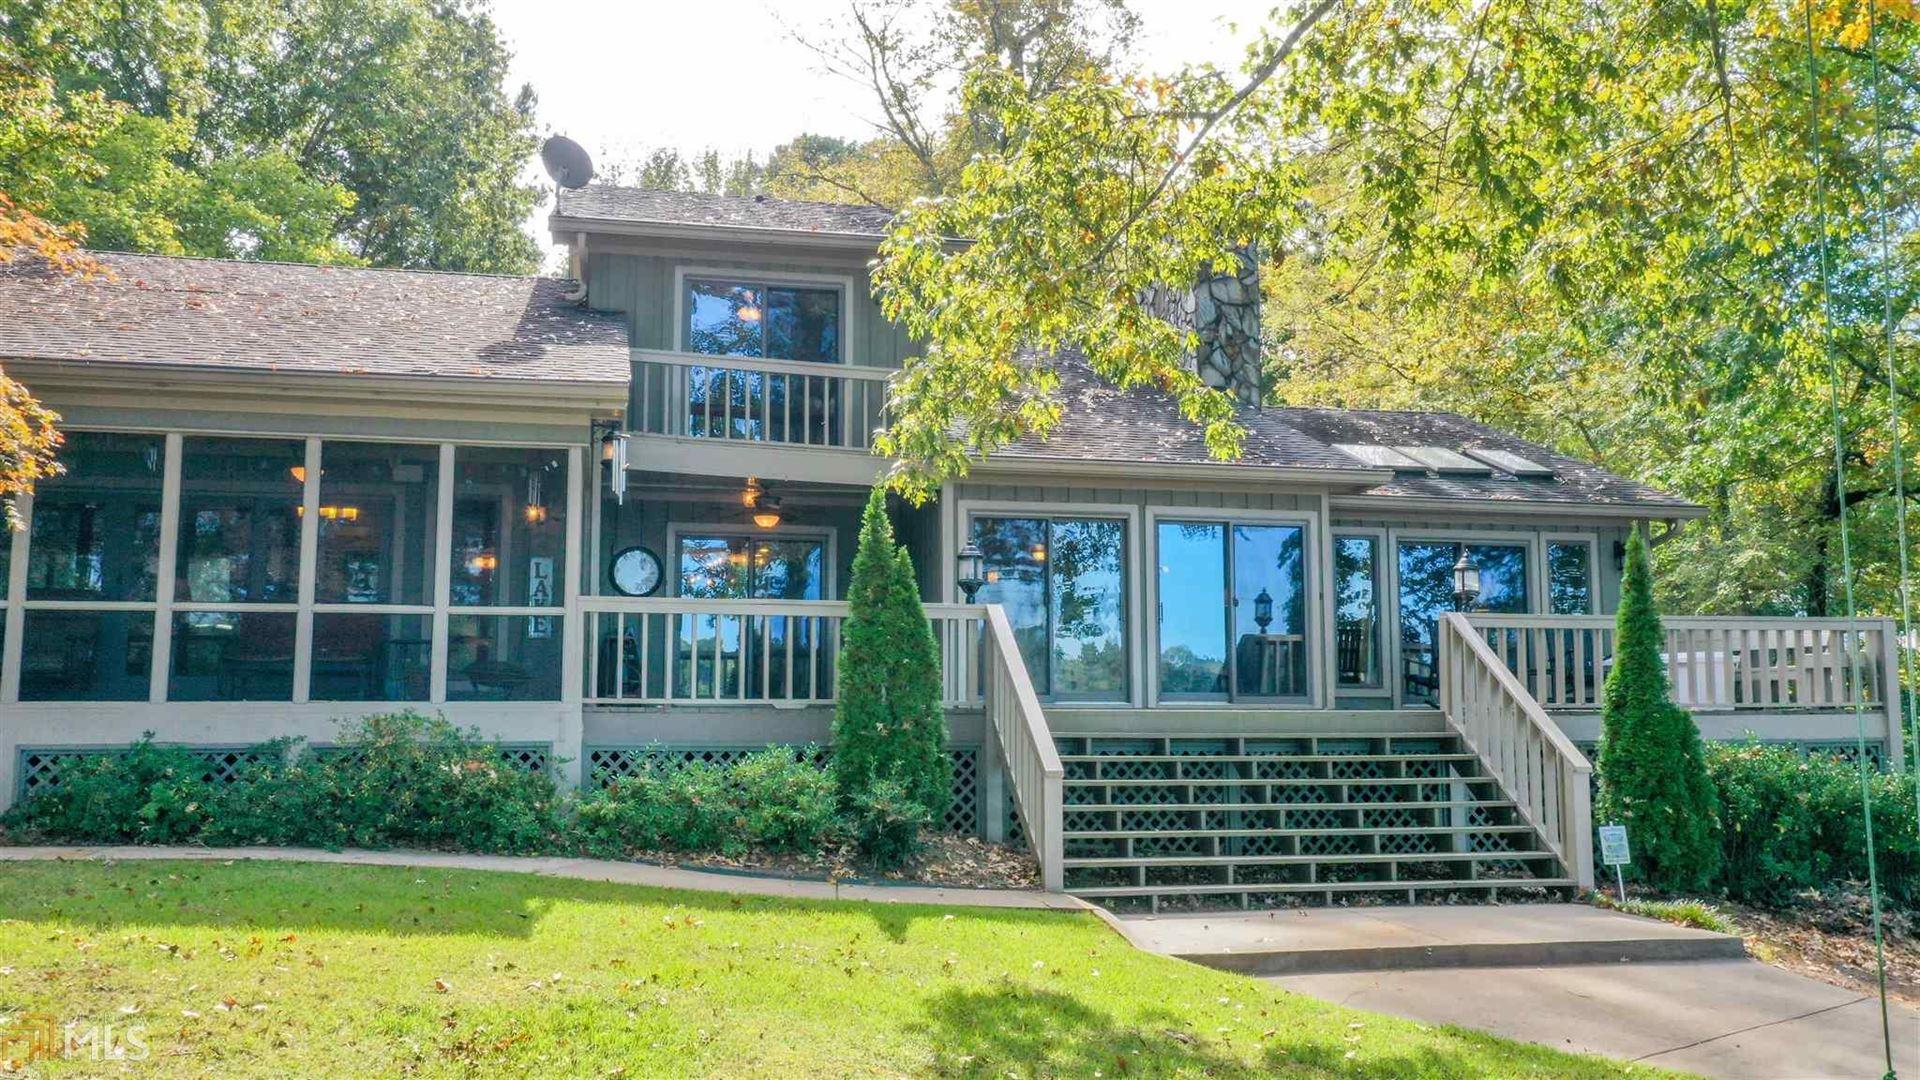 109 Lake Forest Dr, Eatonton, GA 31024 - MLS#: 8872663